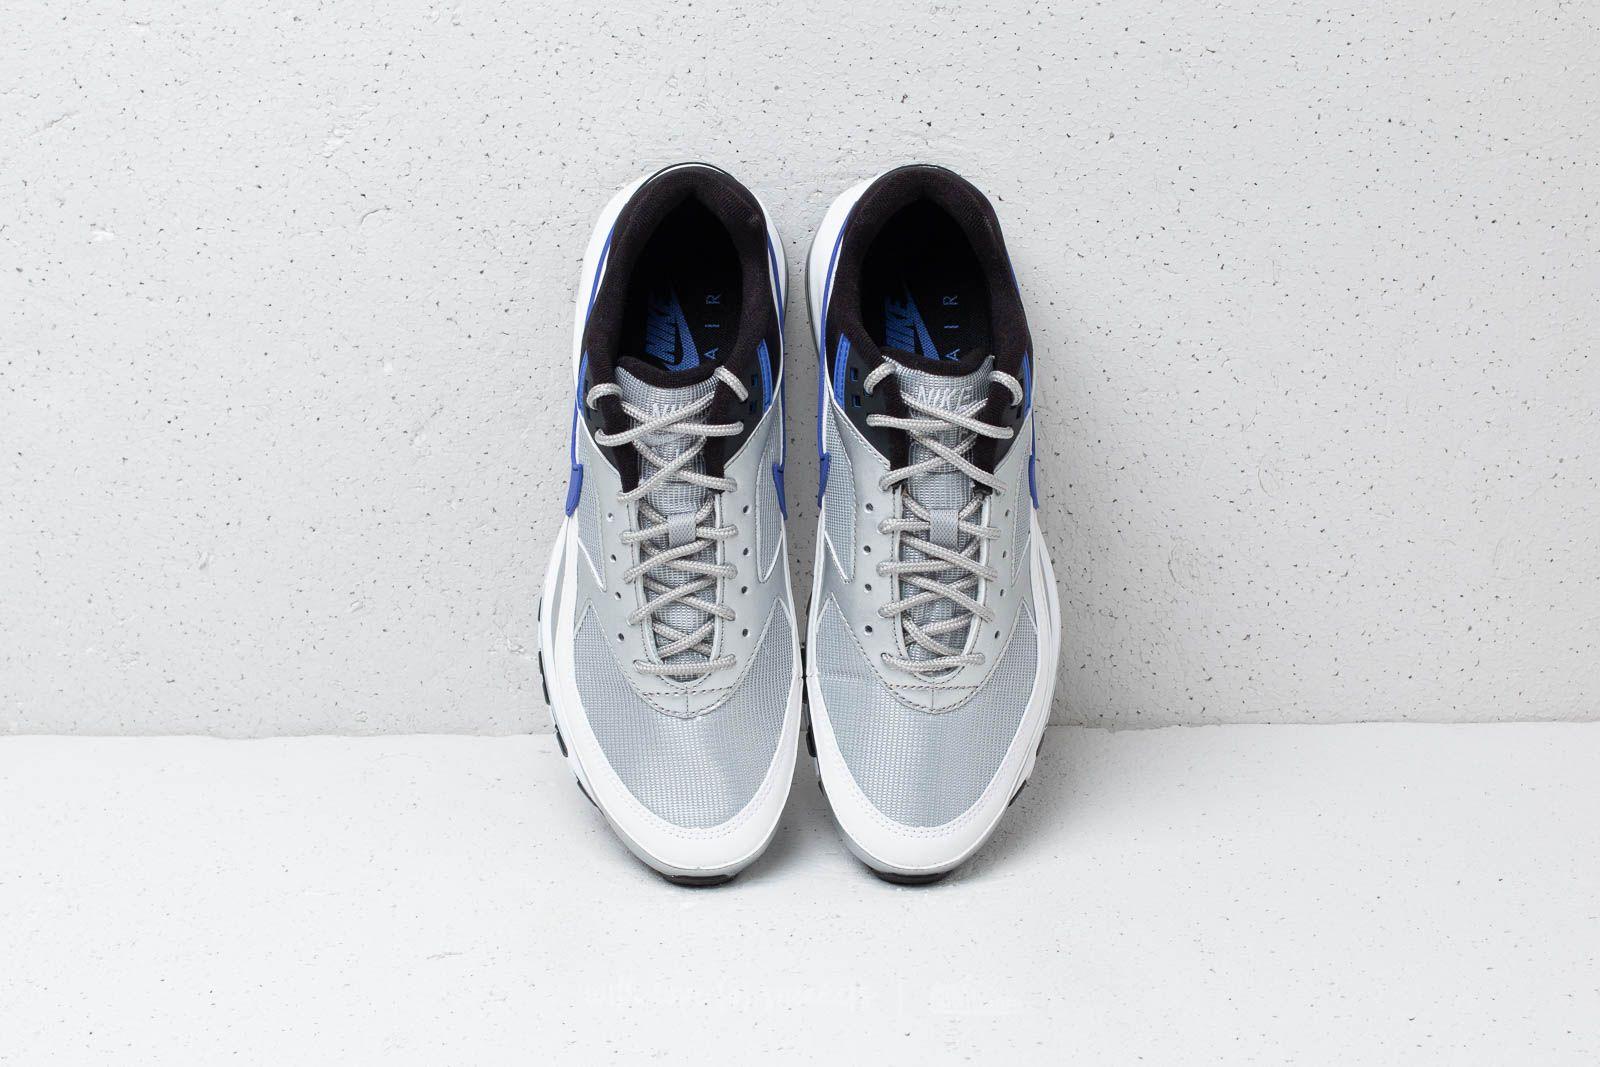 adaae7cc887e Nike Air Max 97 BW Metallic Silver  Persian Violet at a great price £